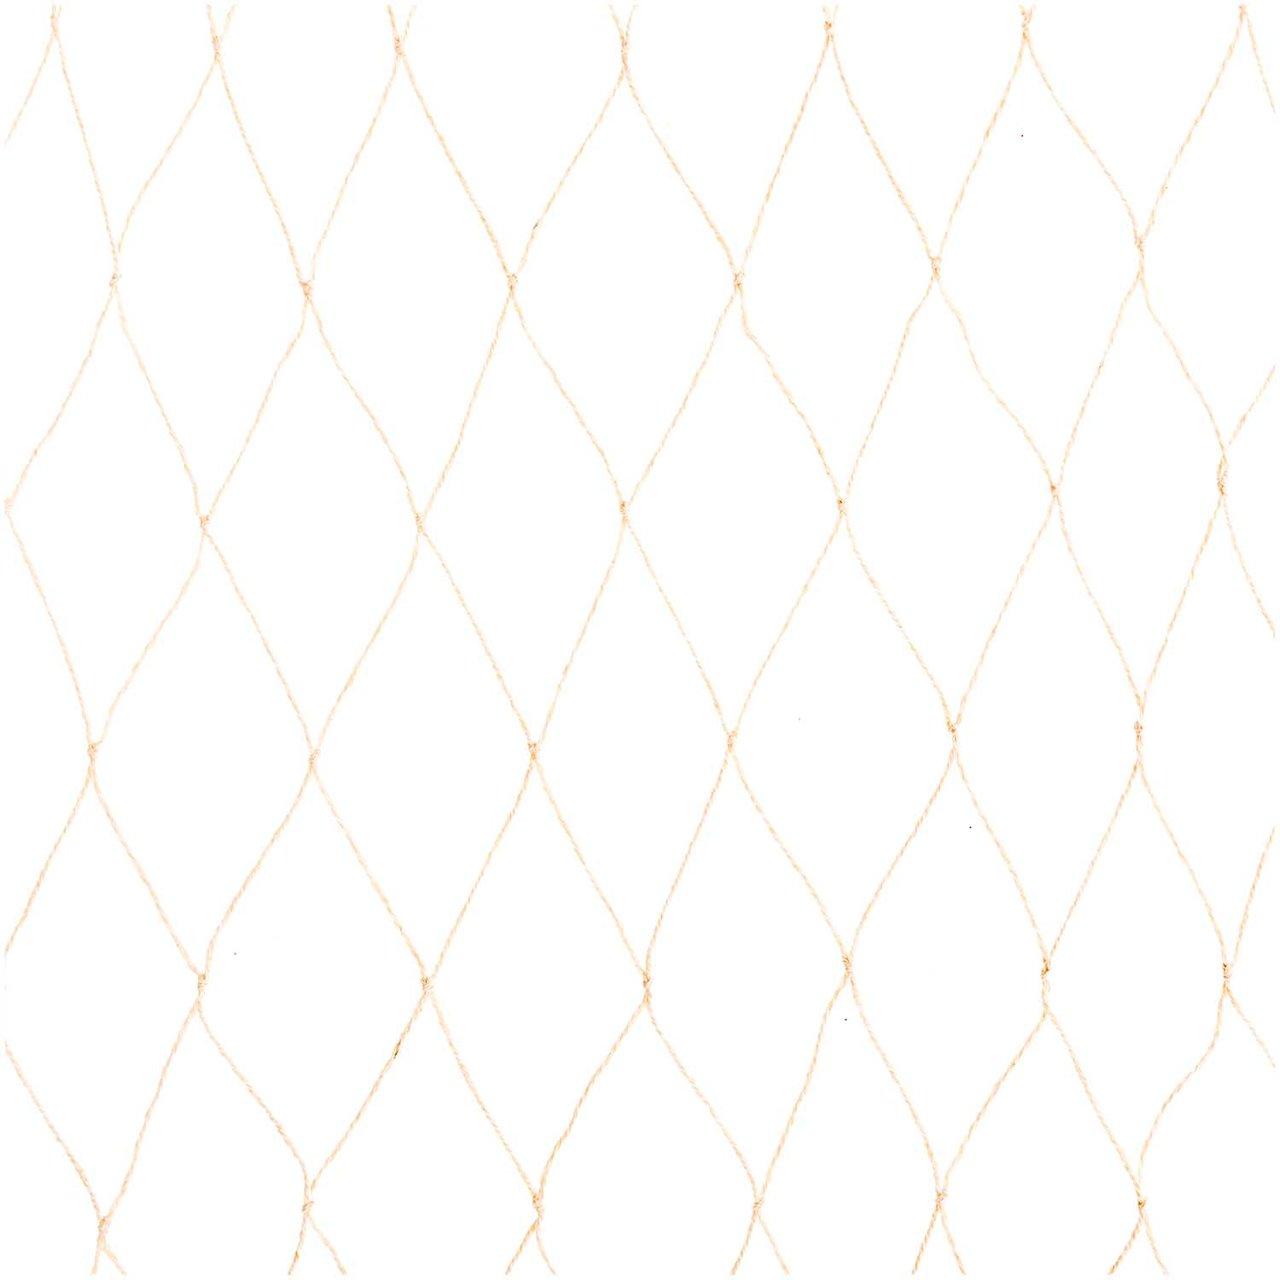 fischernetz 100x200cm. Black Bedroom Furniture Sets. Home Design Ideas